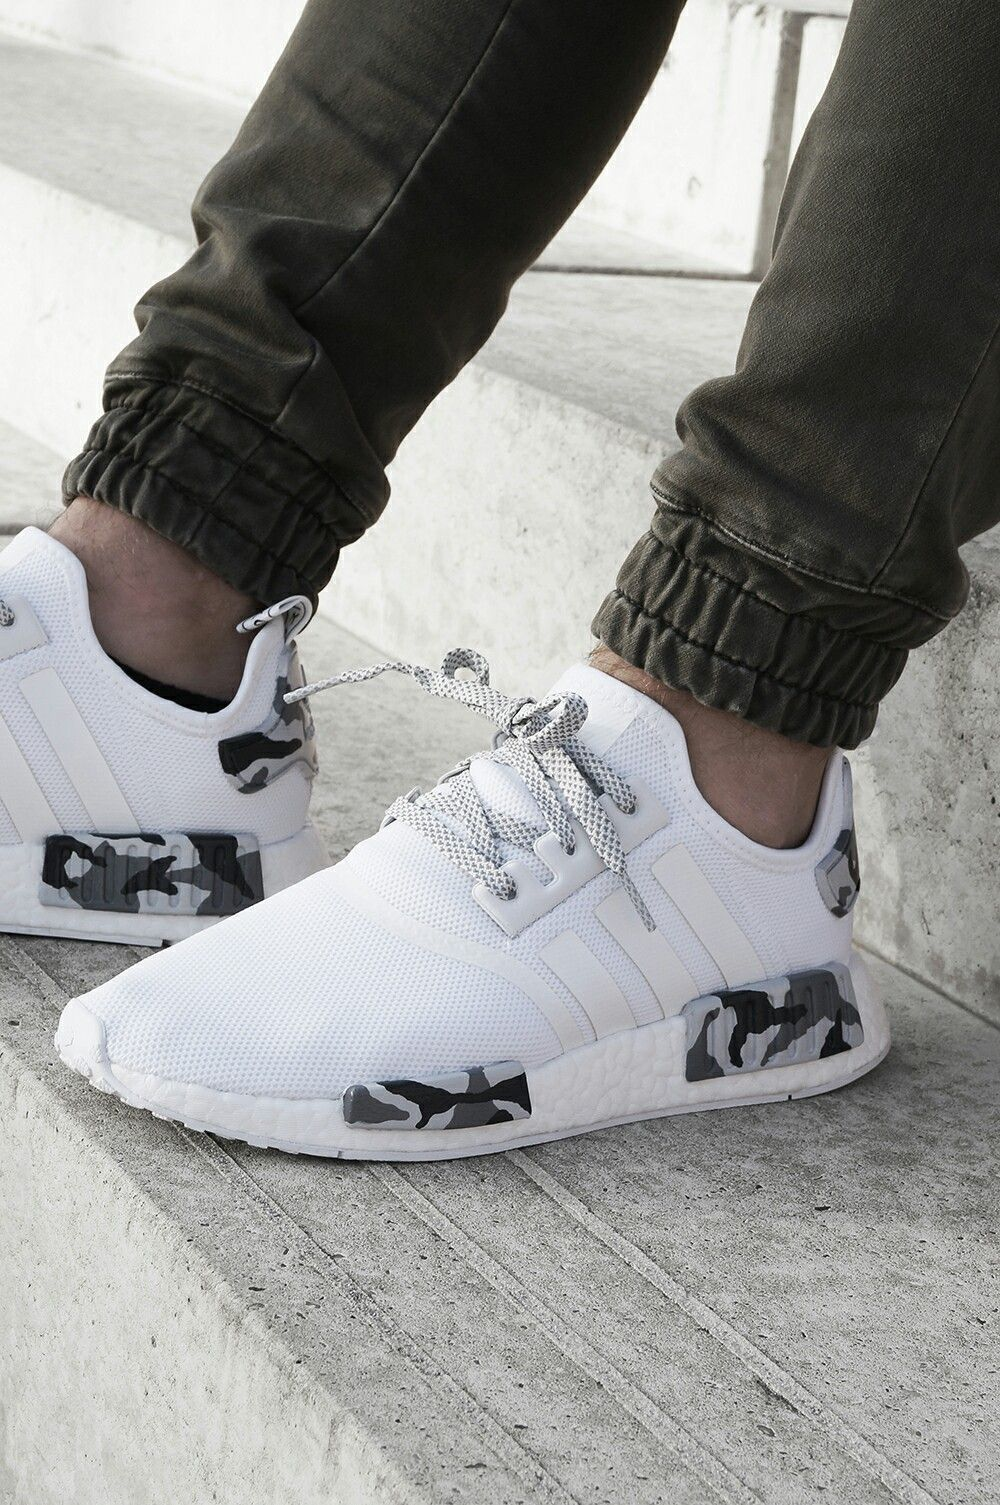 buy popular 0aad0 155c8 Customized Adidas NMD Snow Camo ,Adidas Shoes Online, adidas  shoes